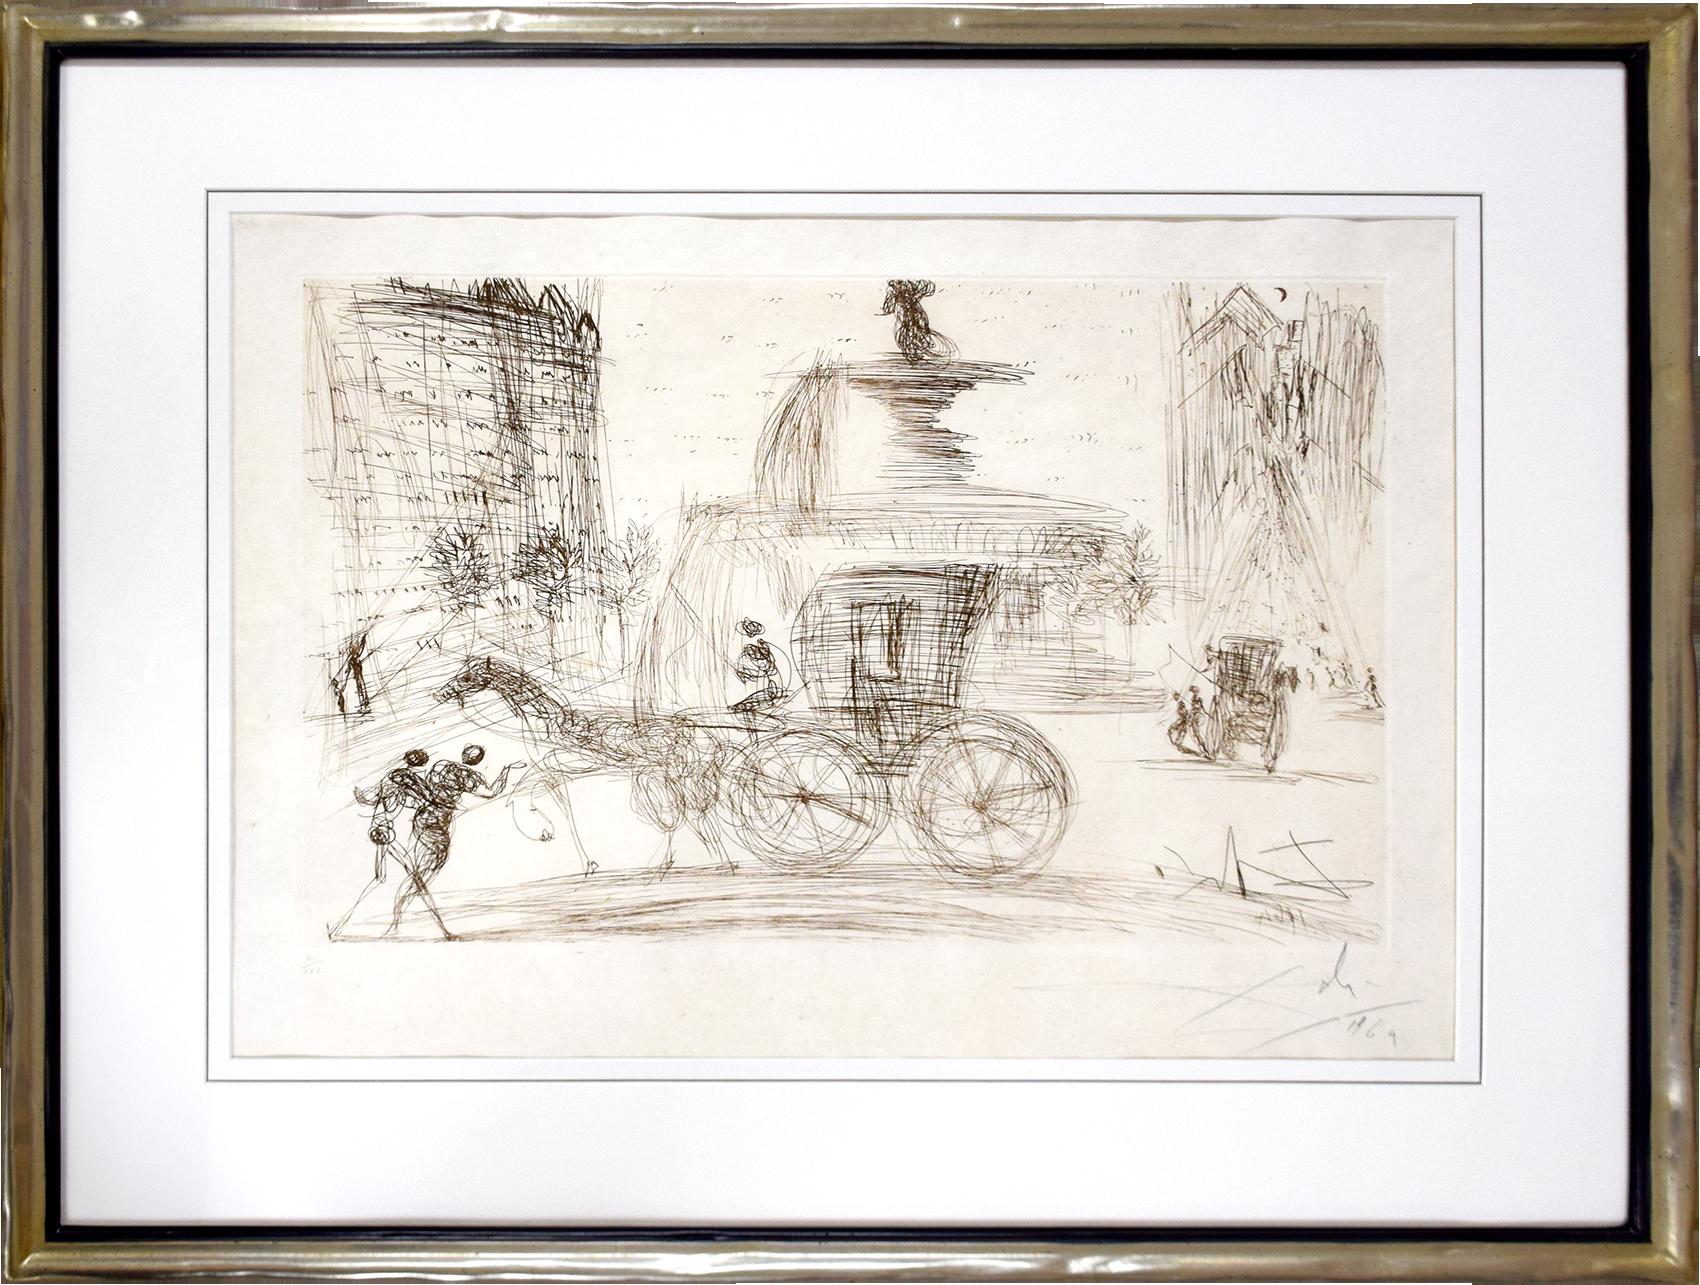 Salvador Dalí - Plaza Fountain, New York City , 0611-008-543